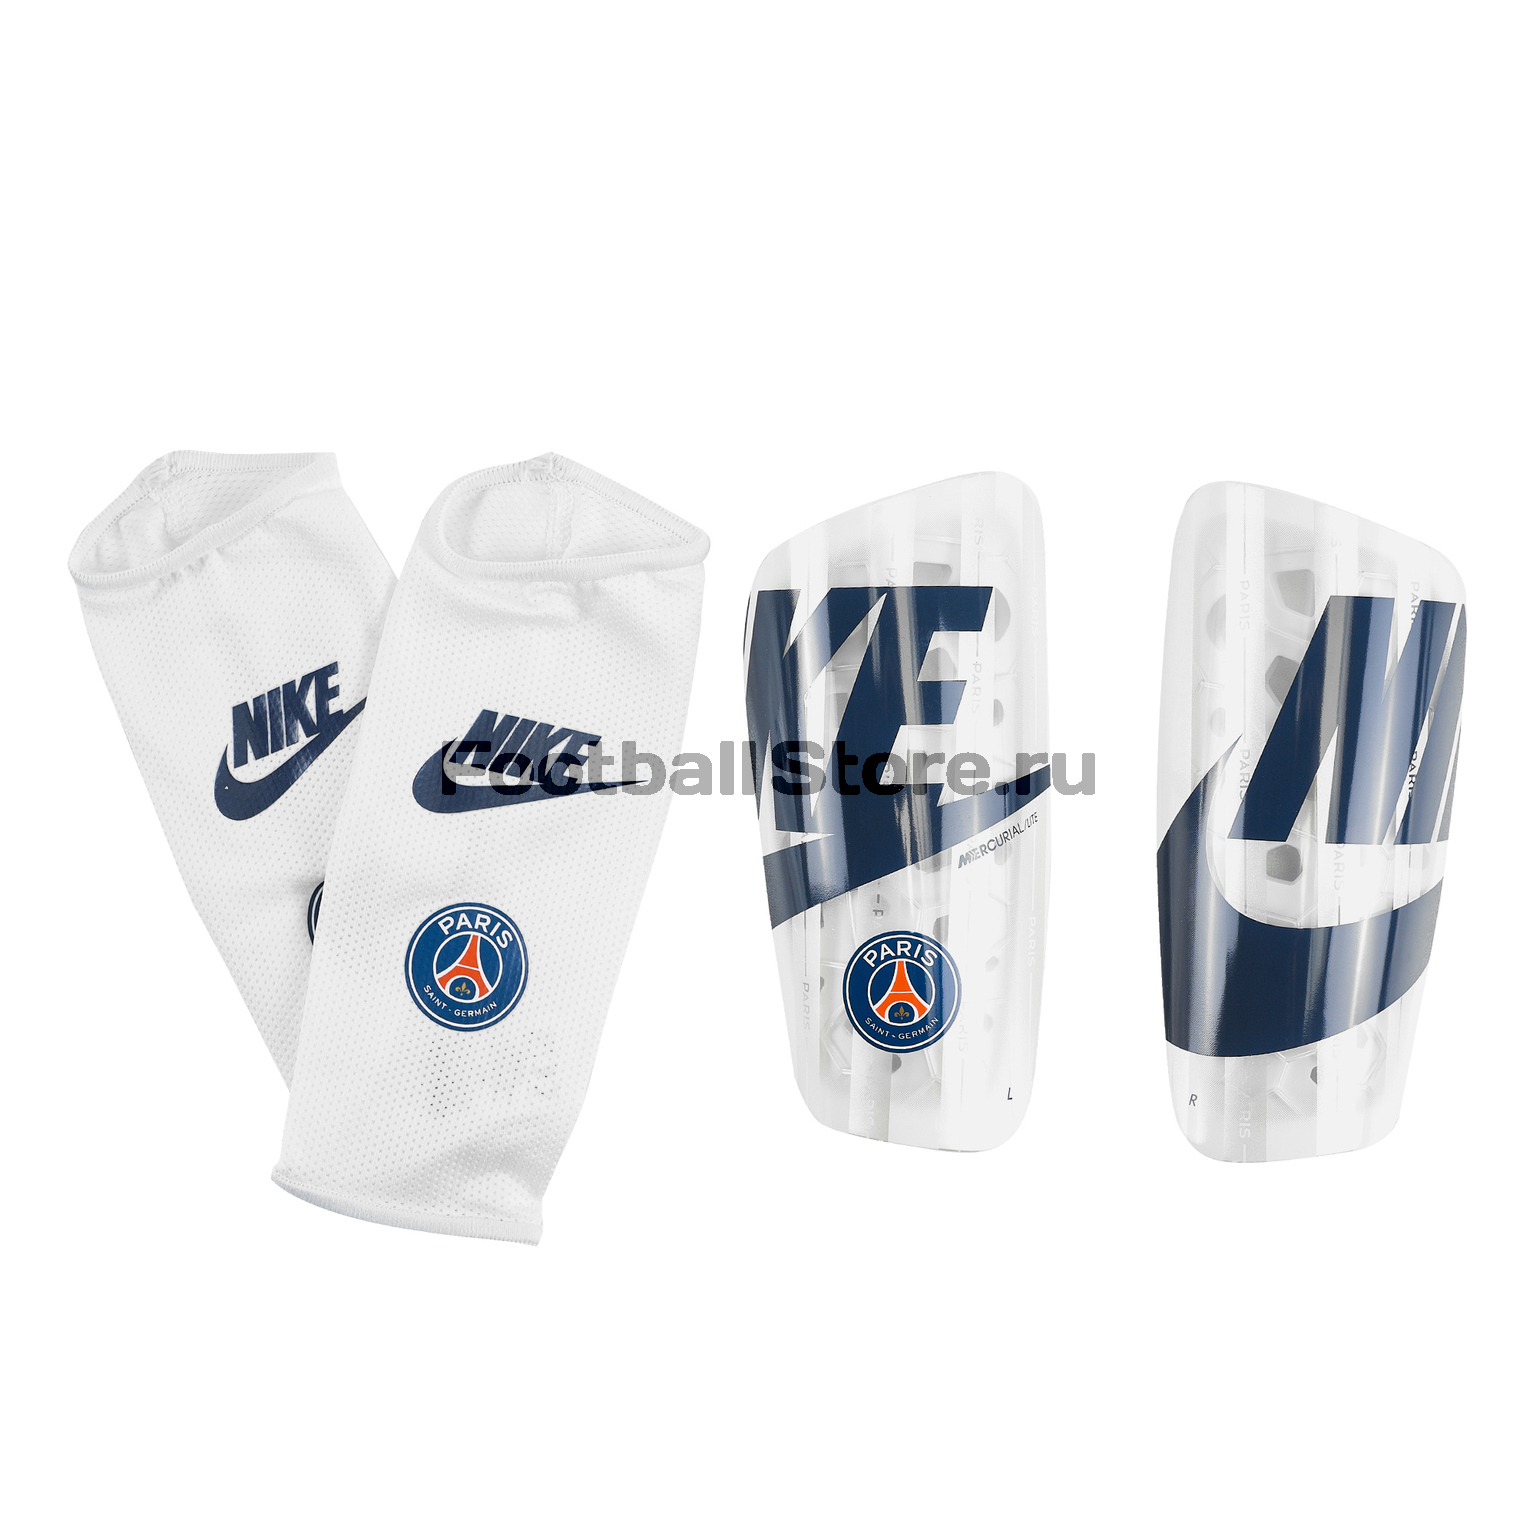 Щитки Nike PSG Mercurial Lite SP2173-100 цена 2017